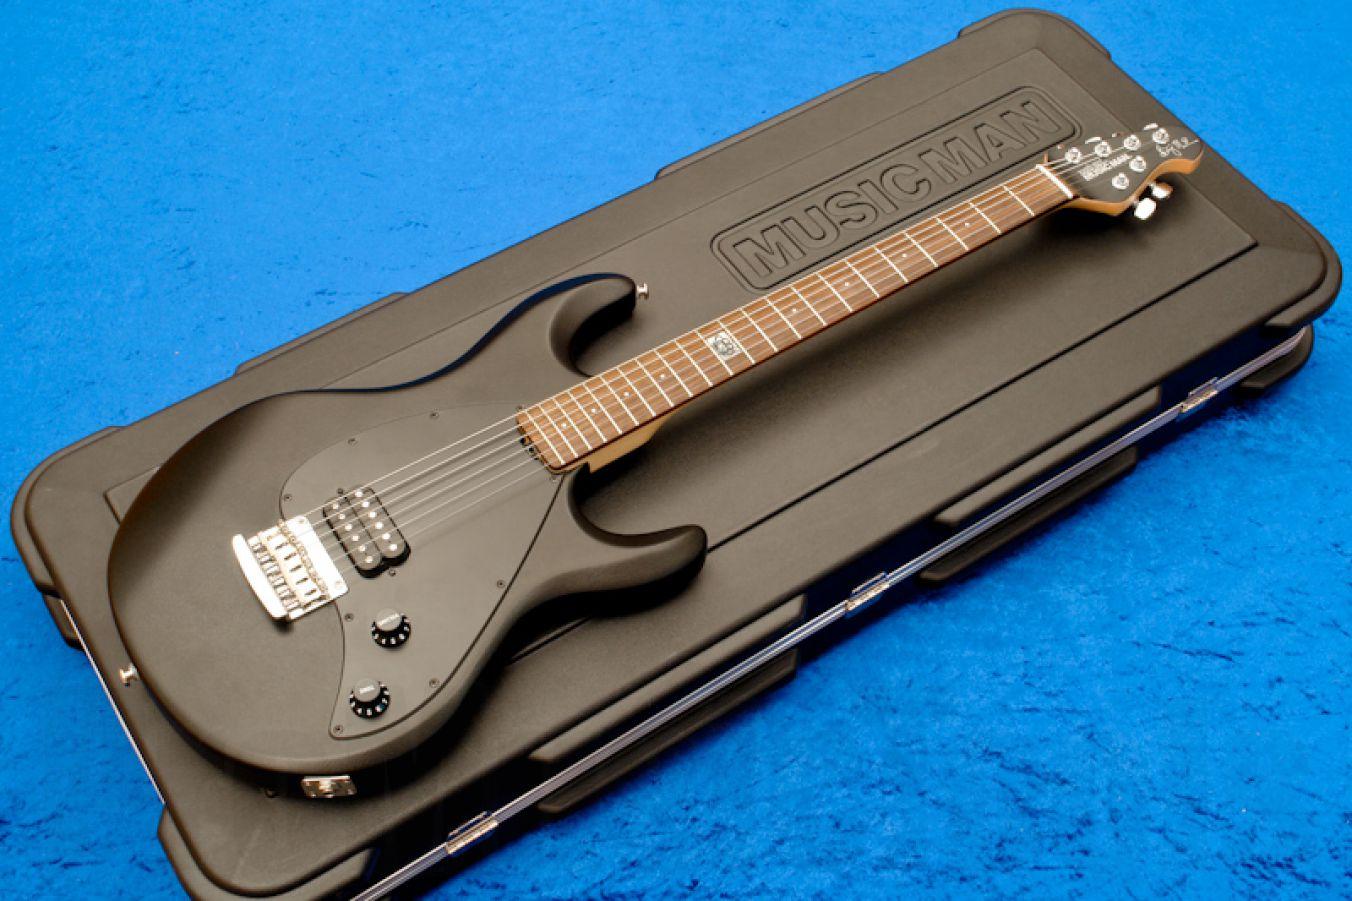 Music Man USA Silhouette Special Benji Madden T1 - Textured Black RW